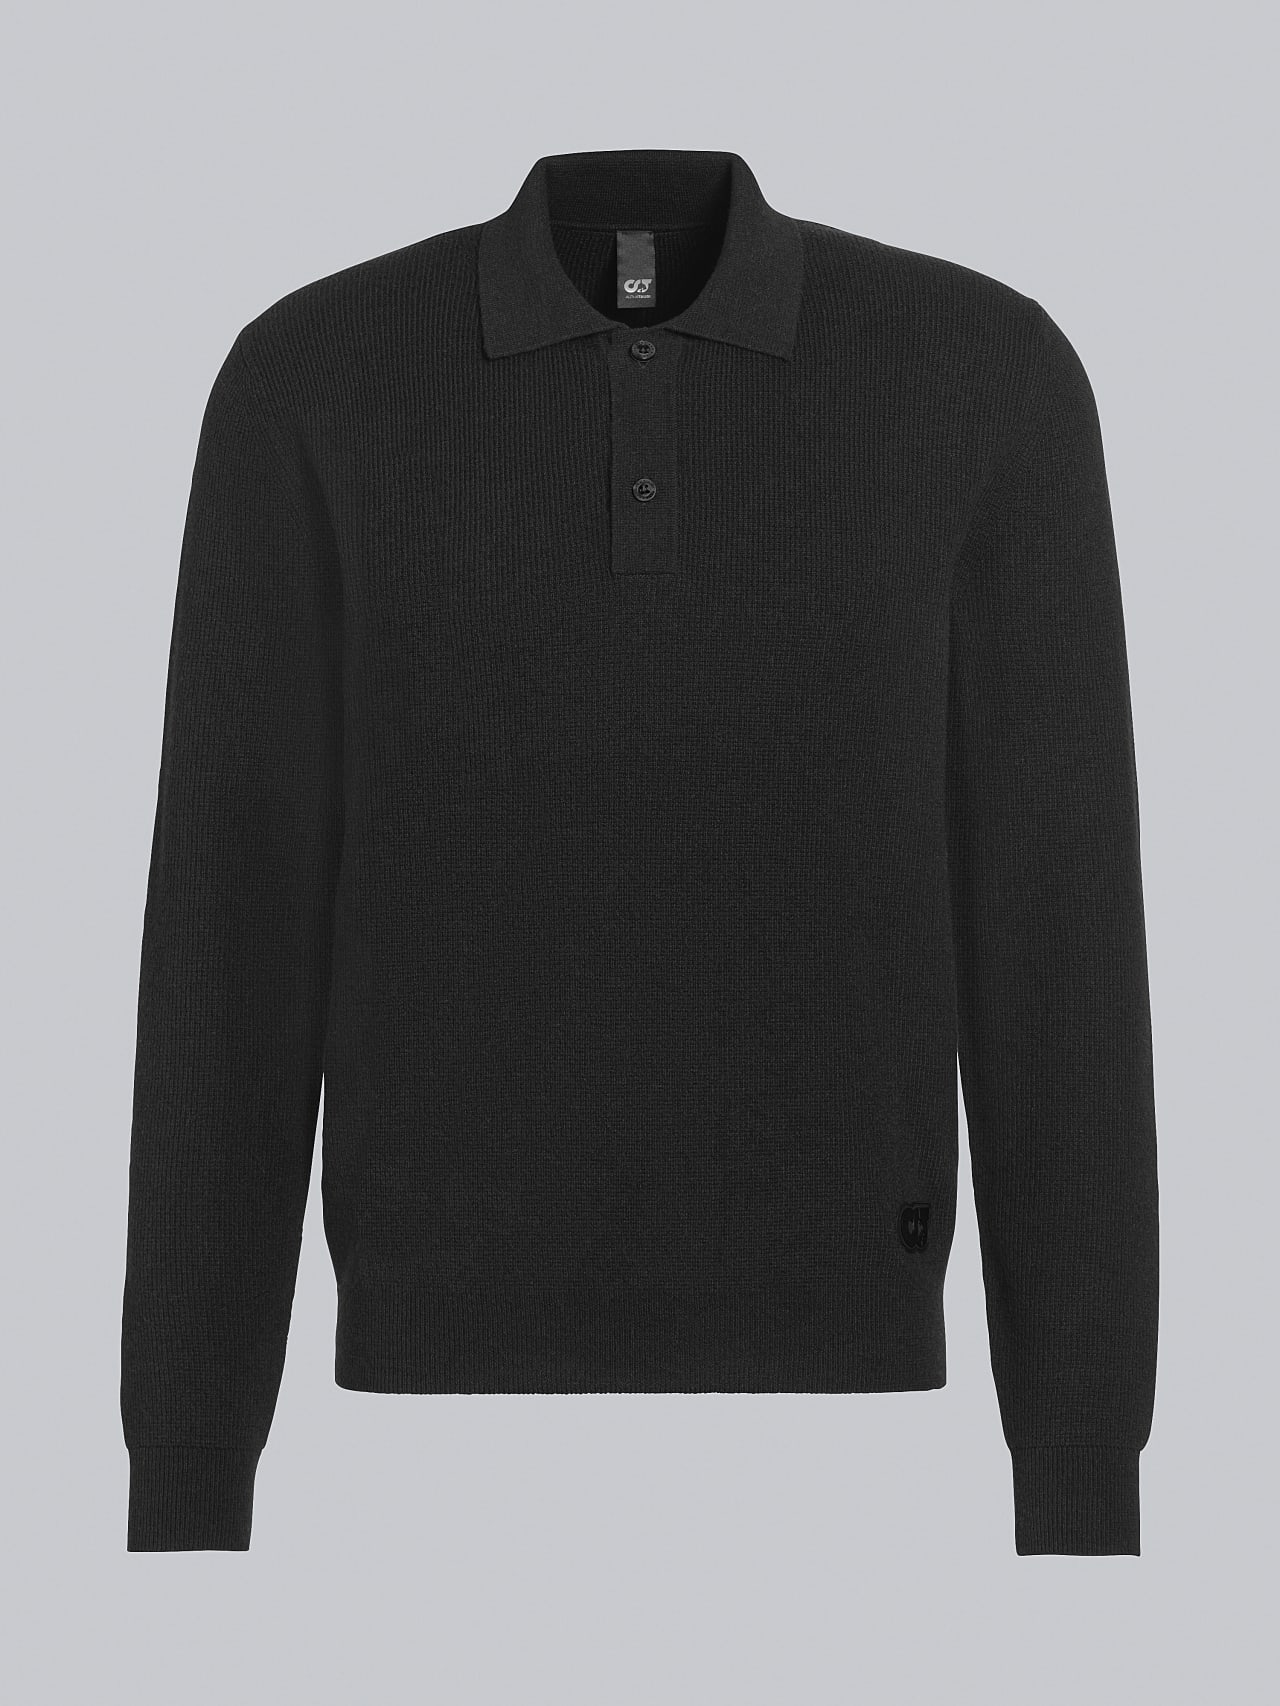 FORCE V1.Y5.02 Cashmere-Blend Knit Polo Longsleeve black Back Alpha Tauri